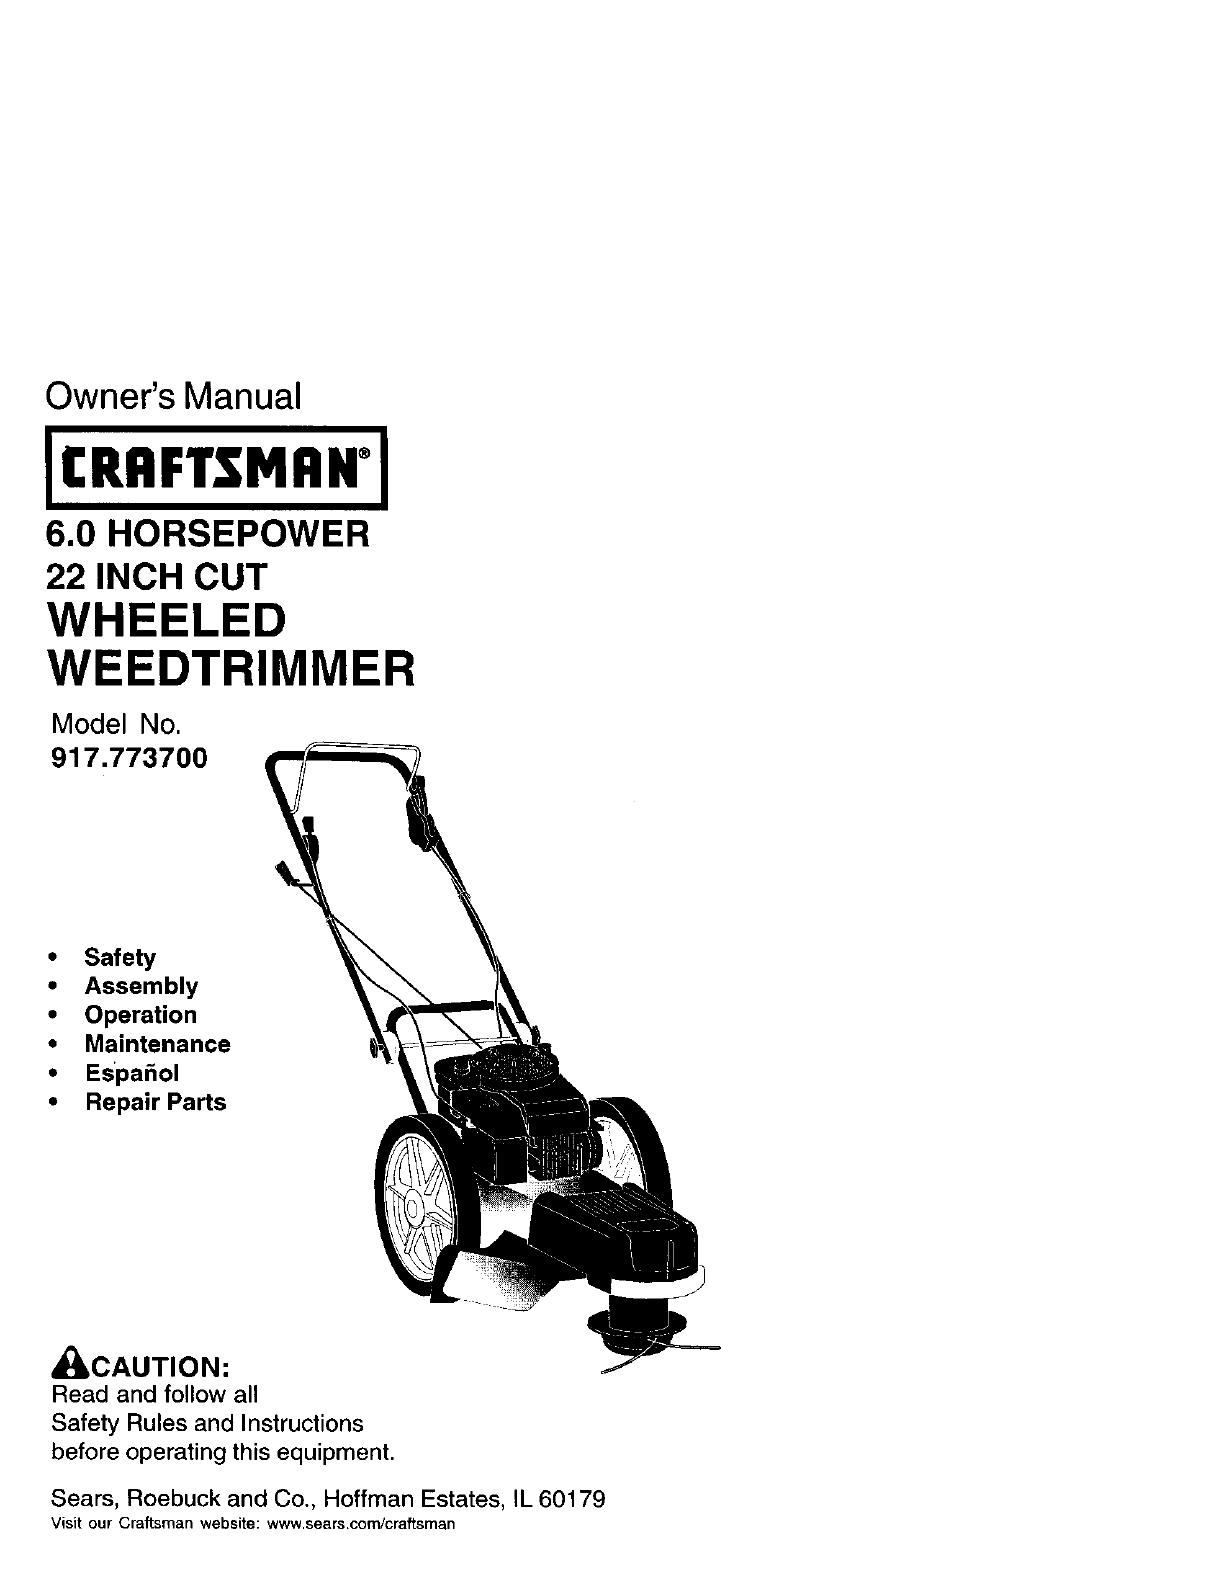 35 Craftsman String Trimmer Parts Diagram